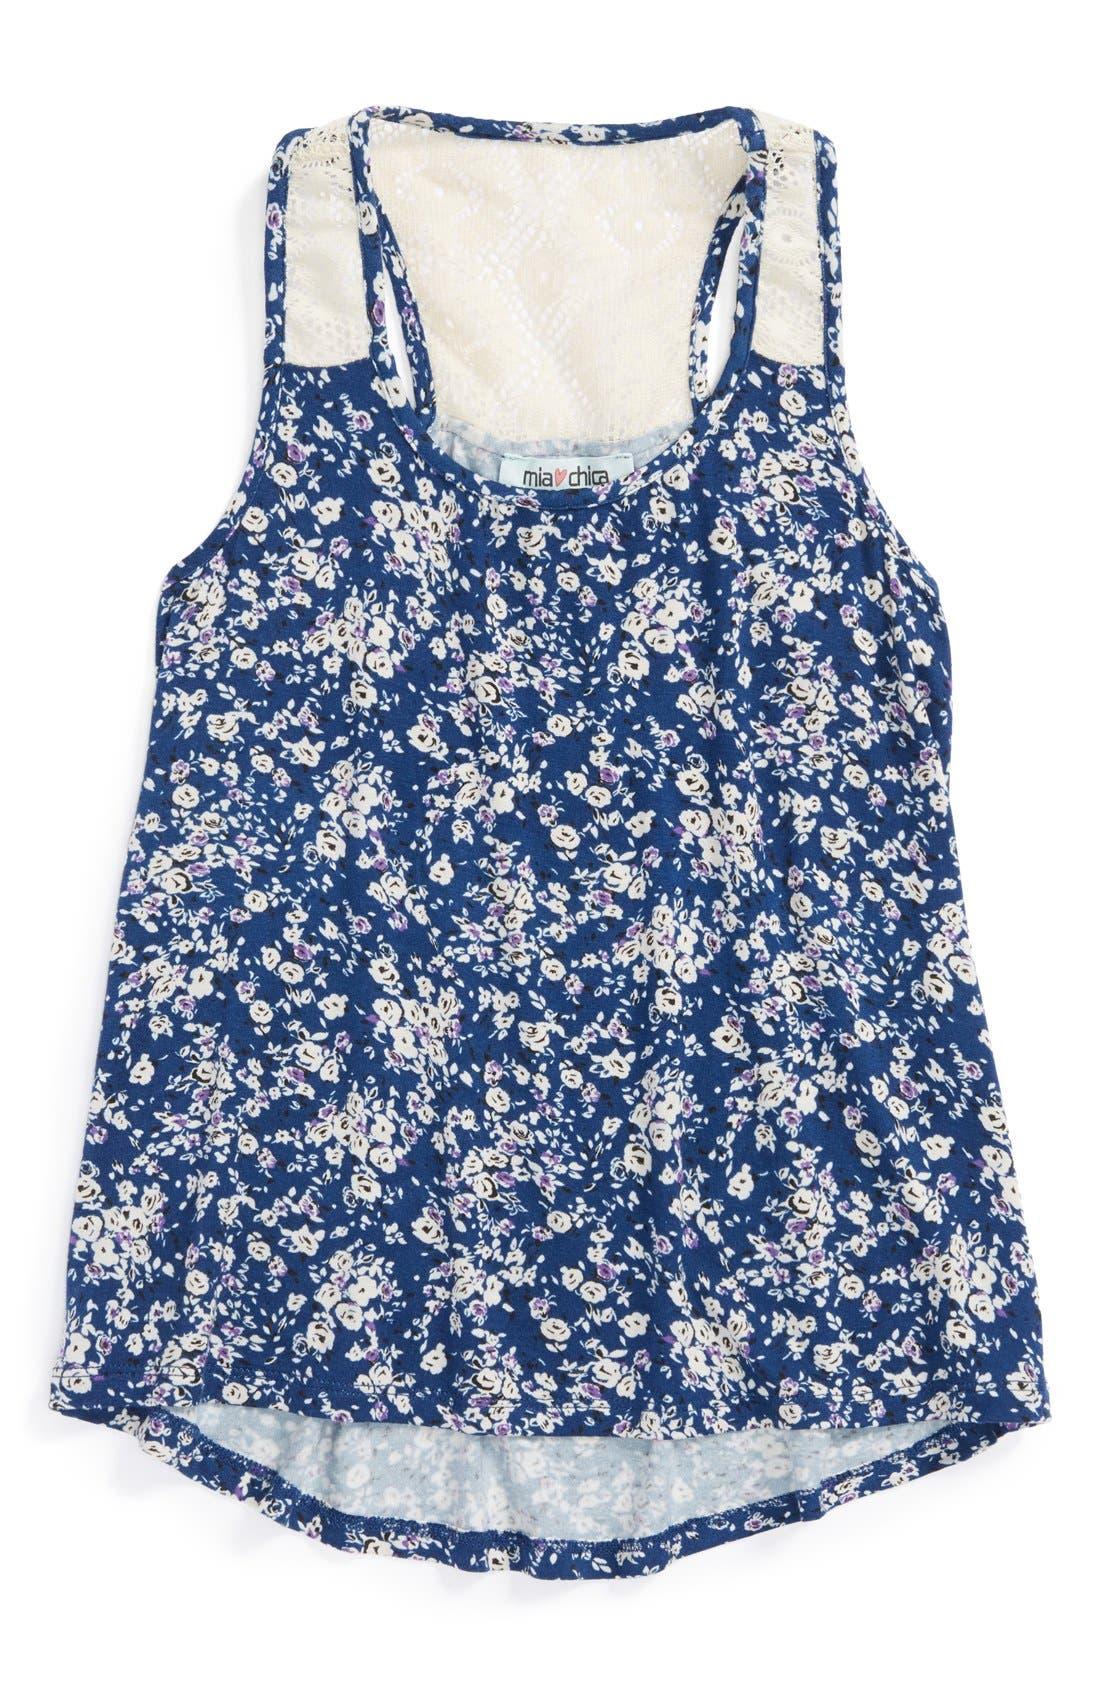 Main Image - Mia Chica Crochet Tank (Big Girls)